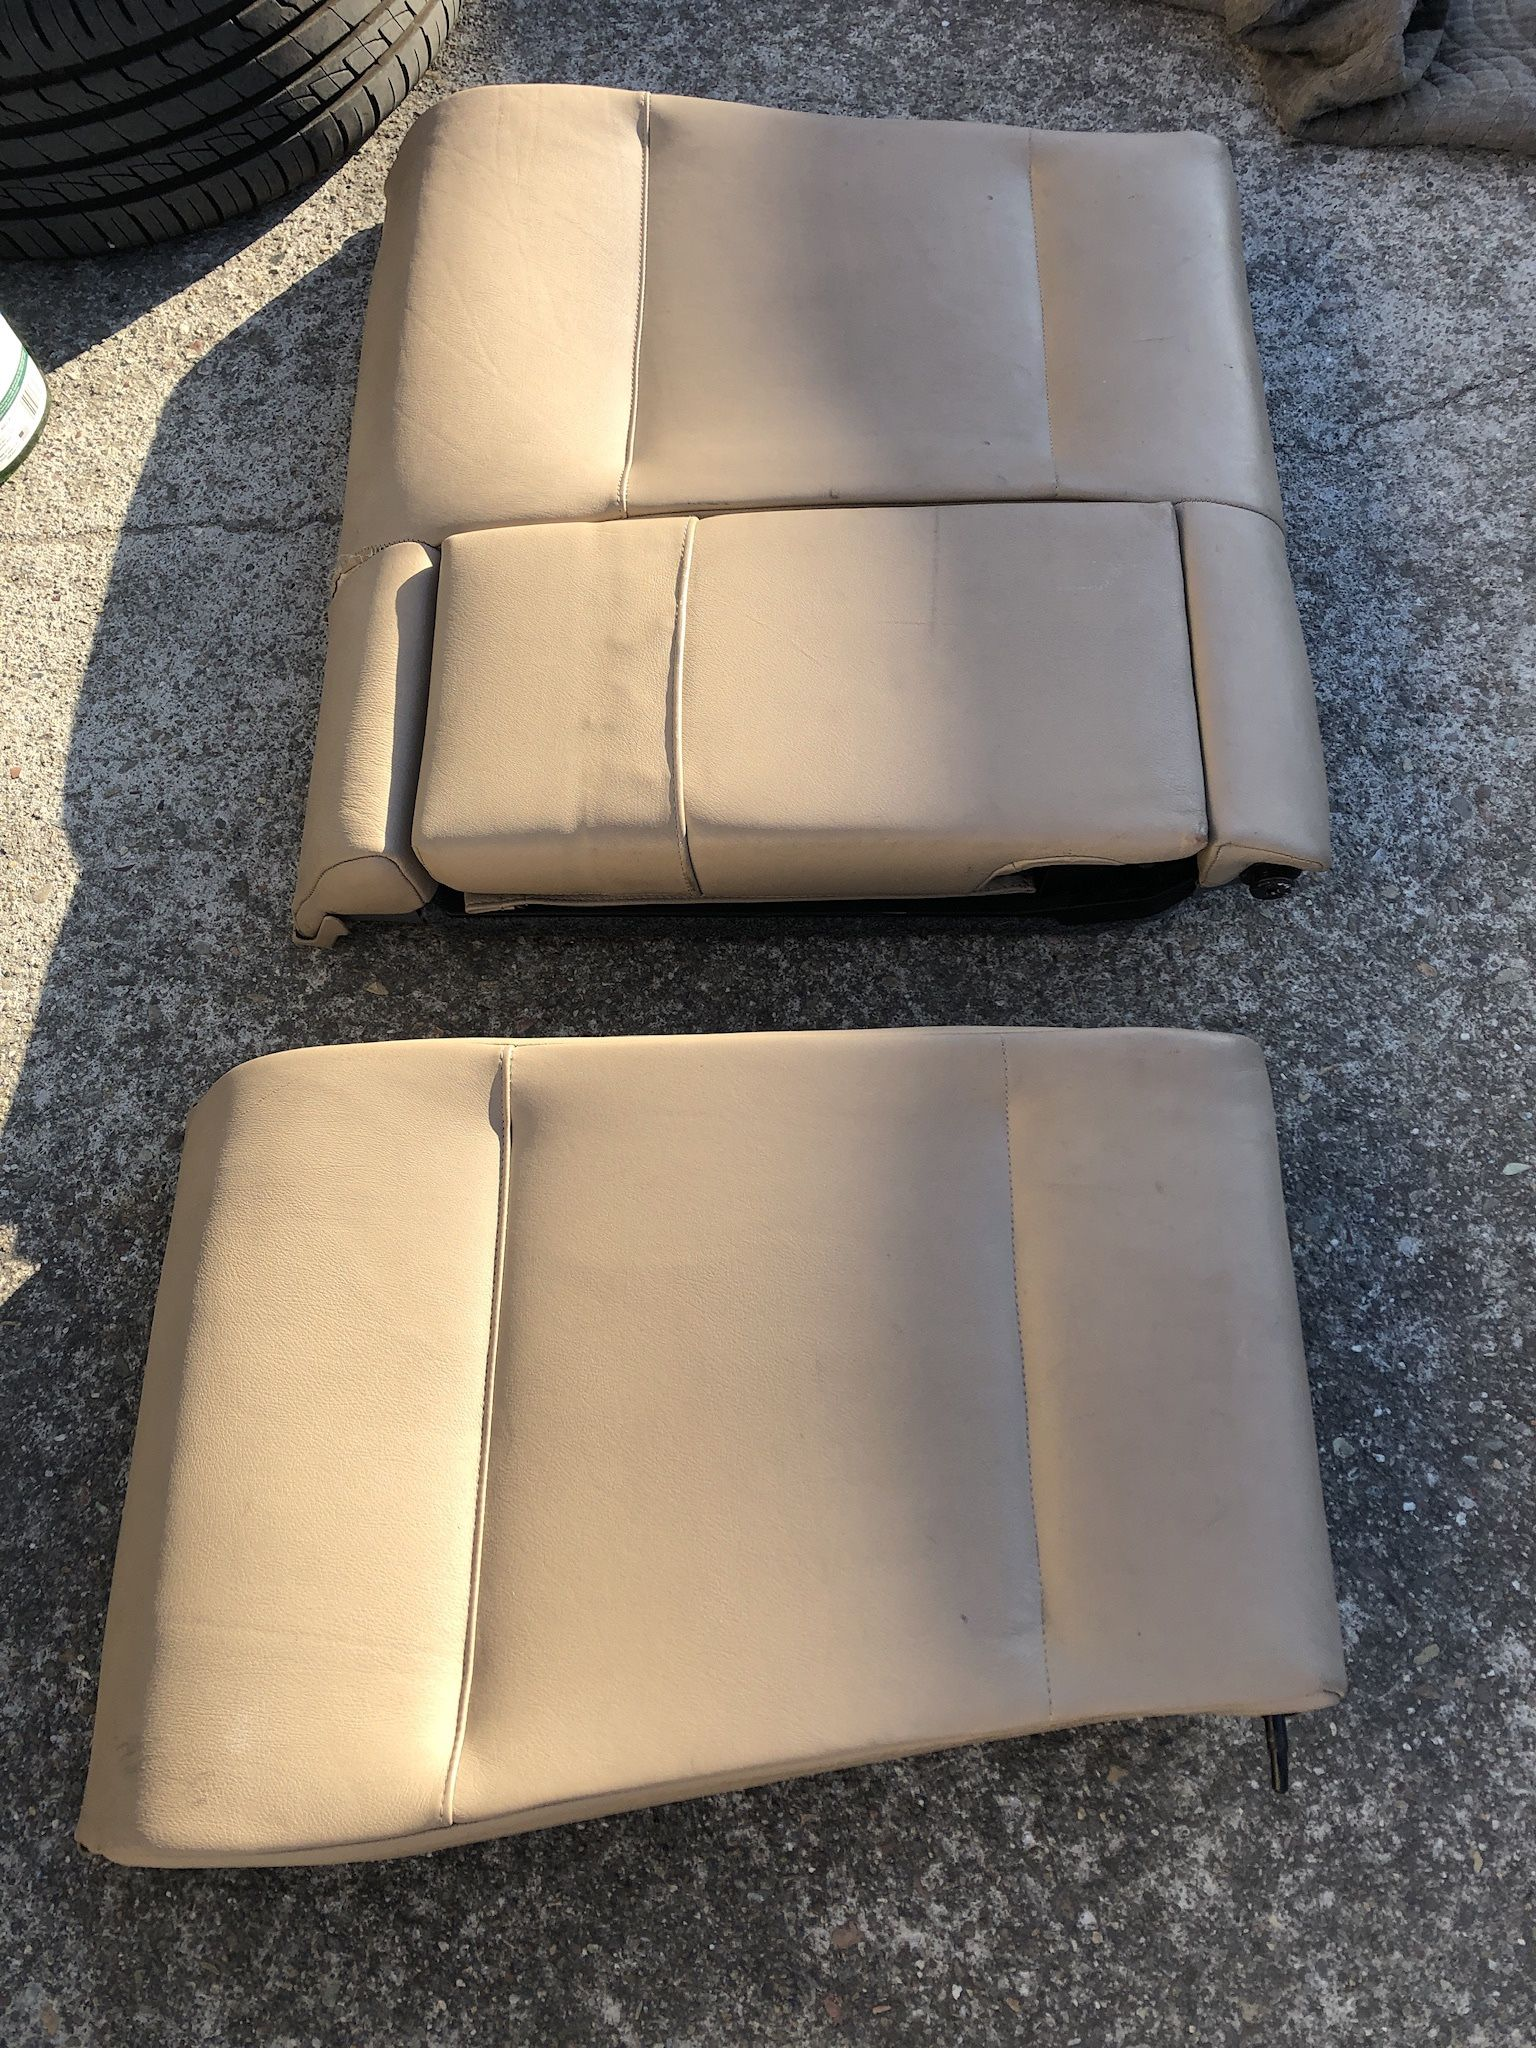 BMW Tan Leather Rear Set Of Seats